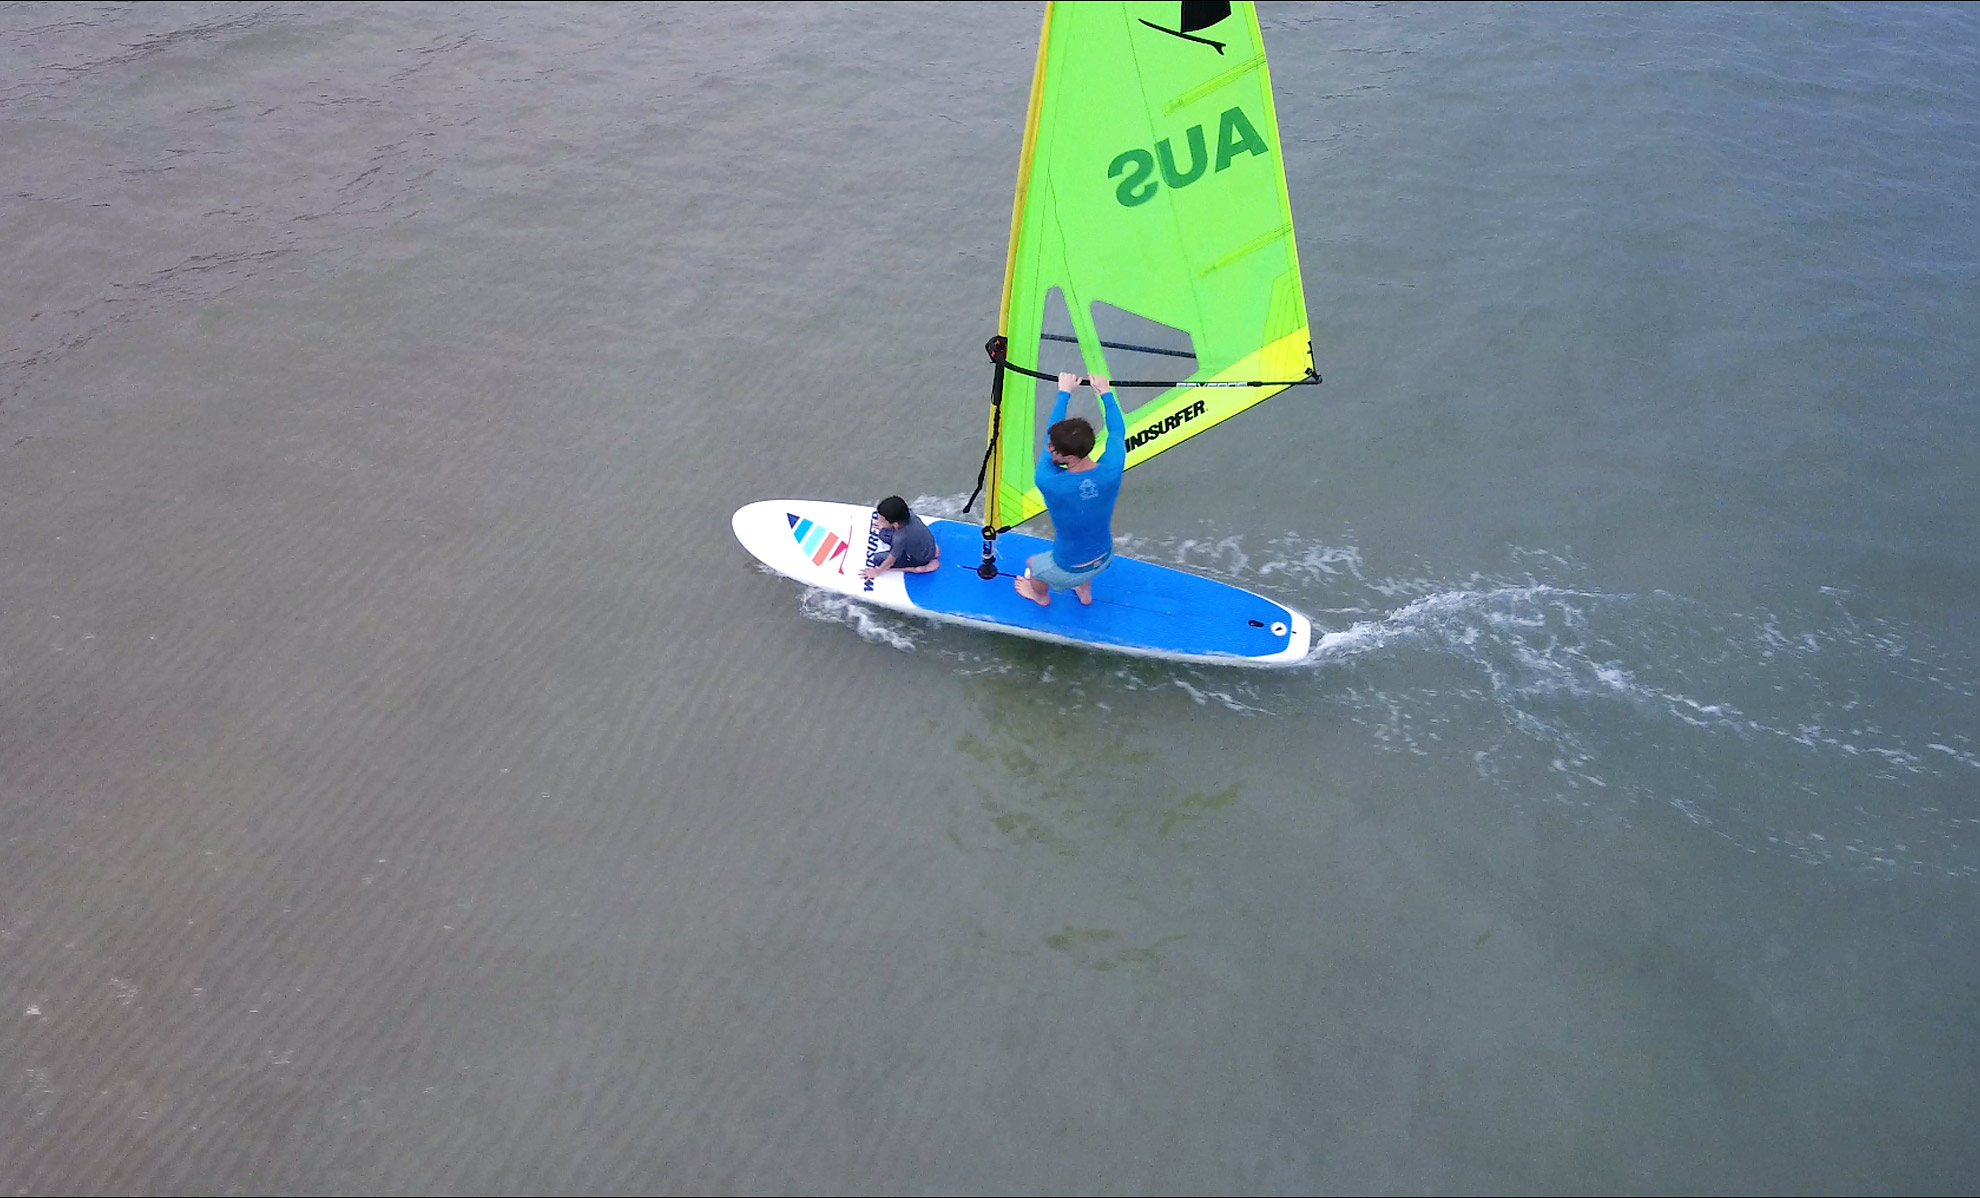 Windsurfer Lt 2020 - Starboard Windsurfing